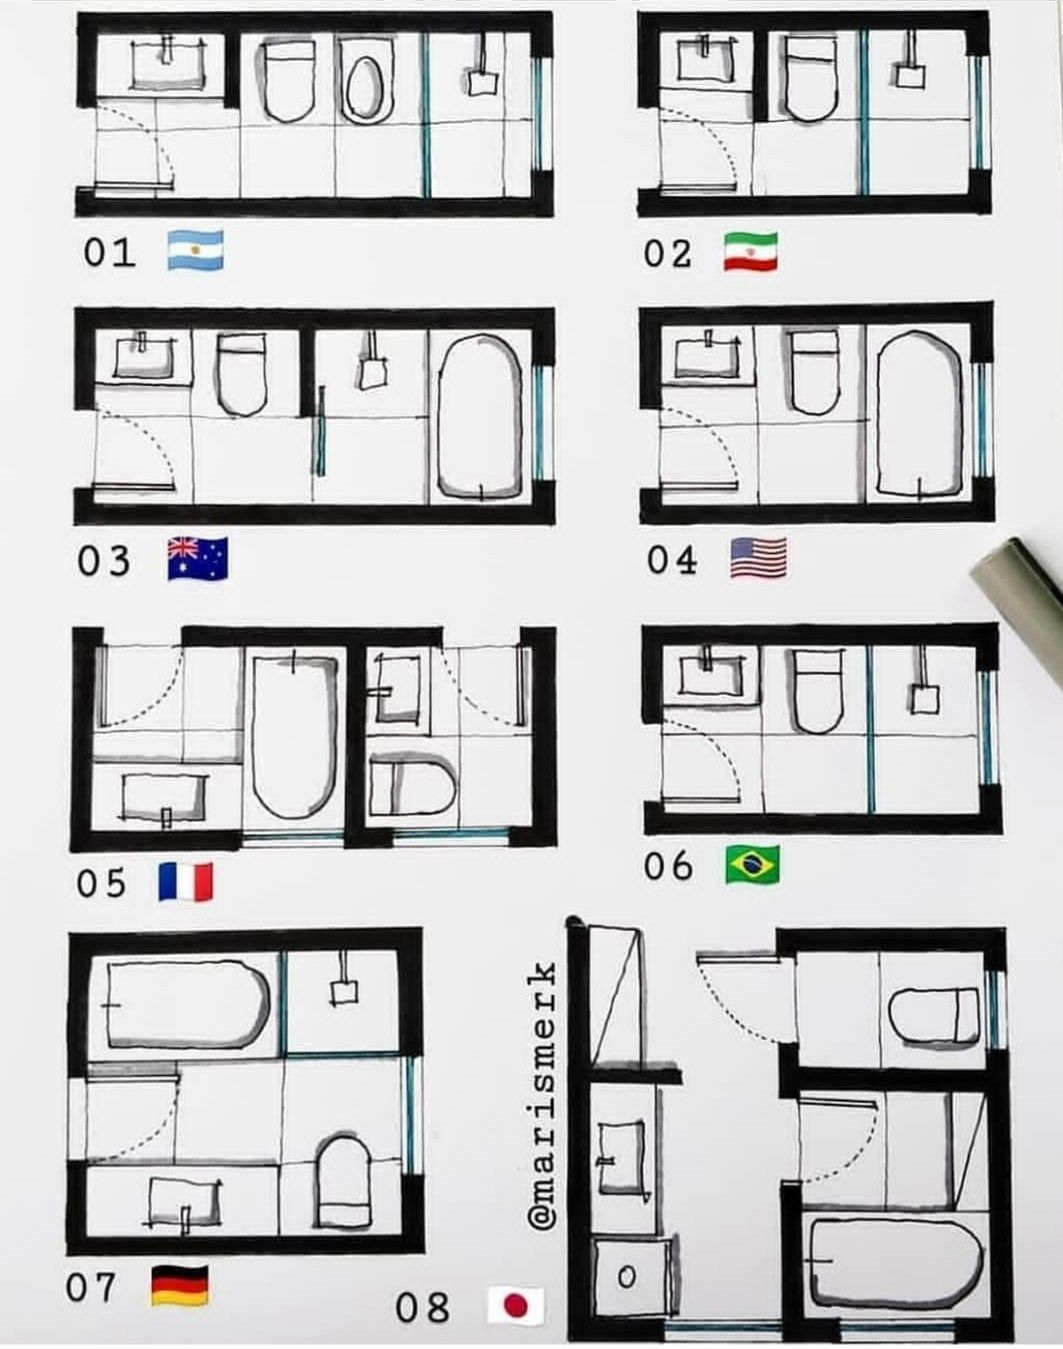 Pin By It S Mi On Salle De Bain In 2020 Bathroom Layout Plans Bathroom Design Layout Small Bathroom Plans